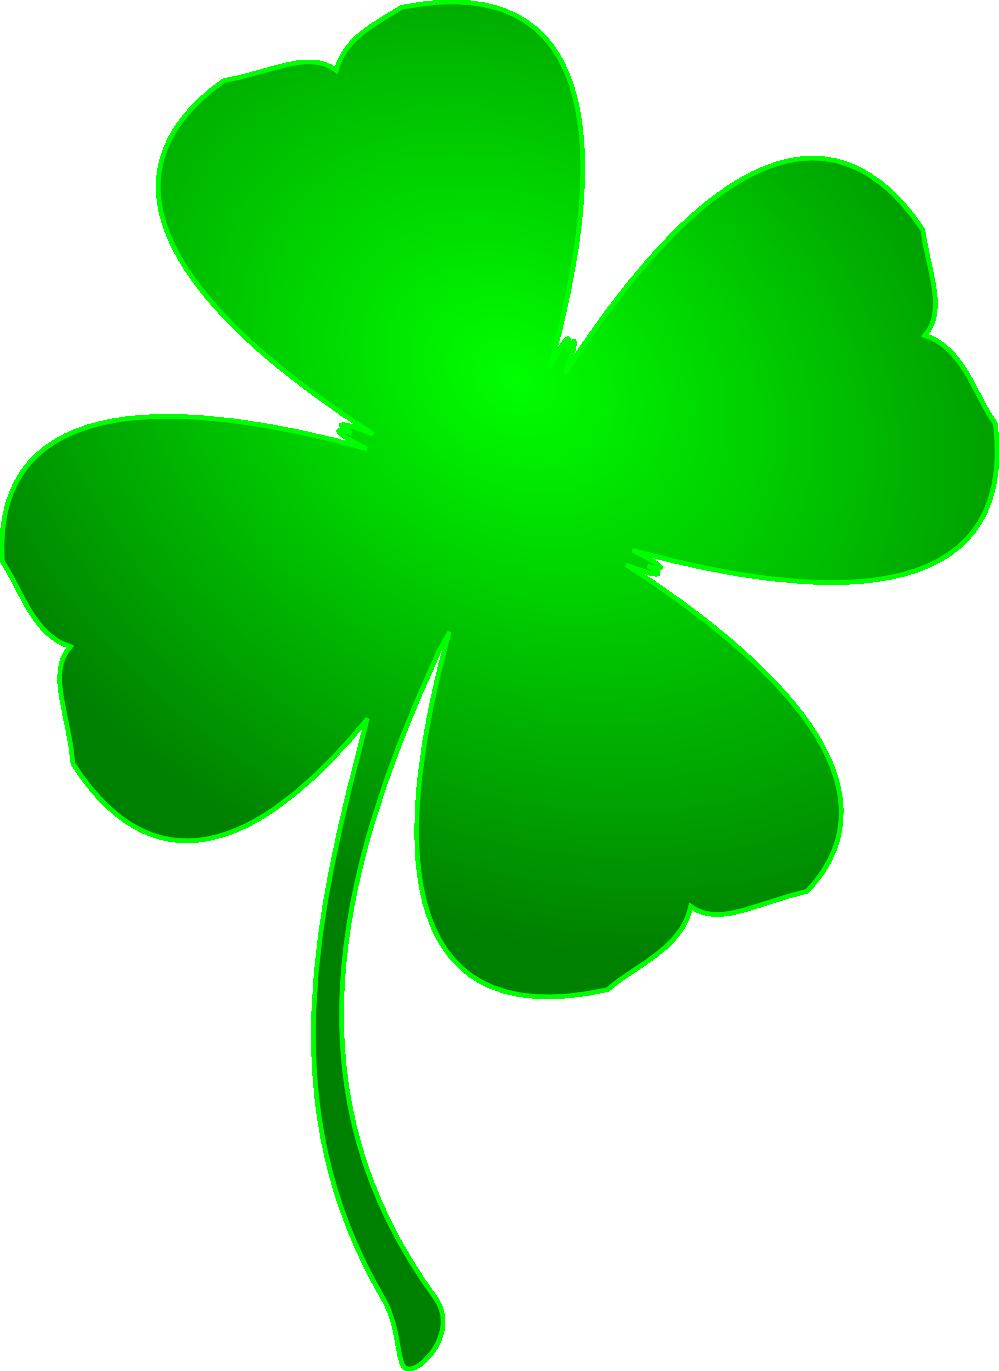 999x1371 Clip Art Irish Lucky Clover Saint Patricks Day